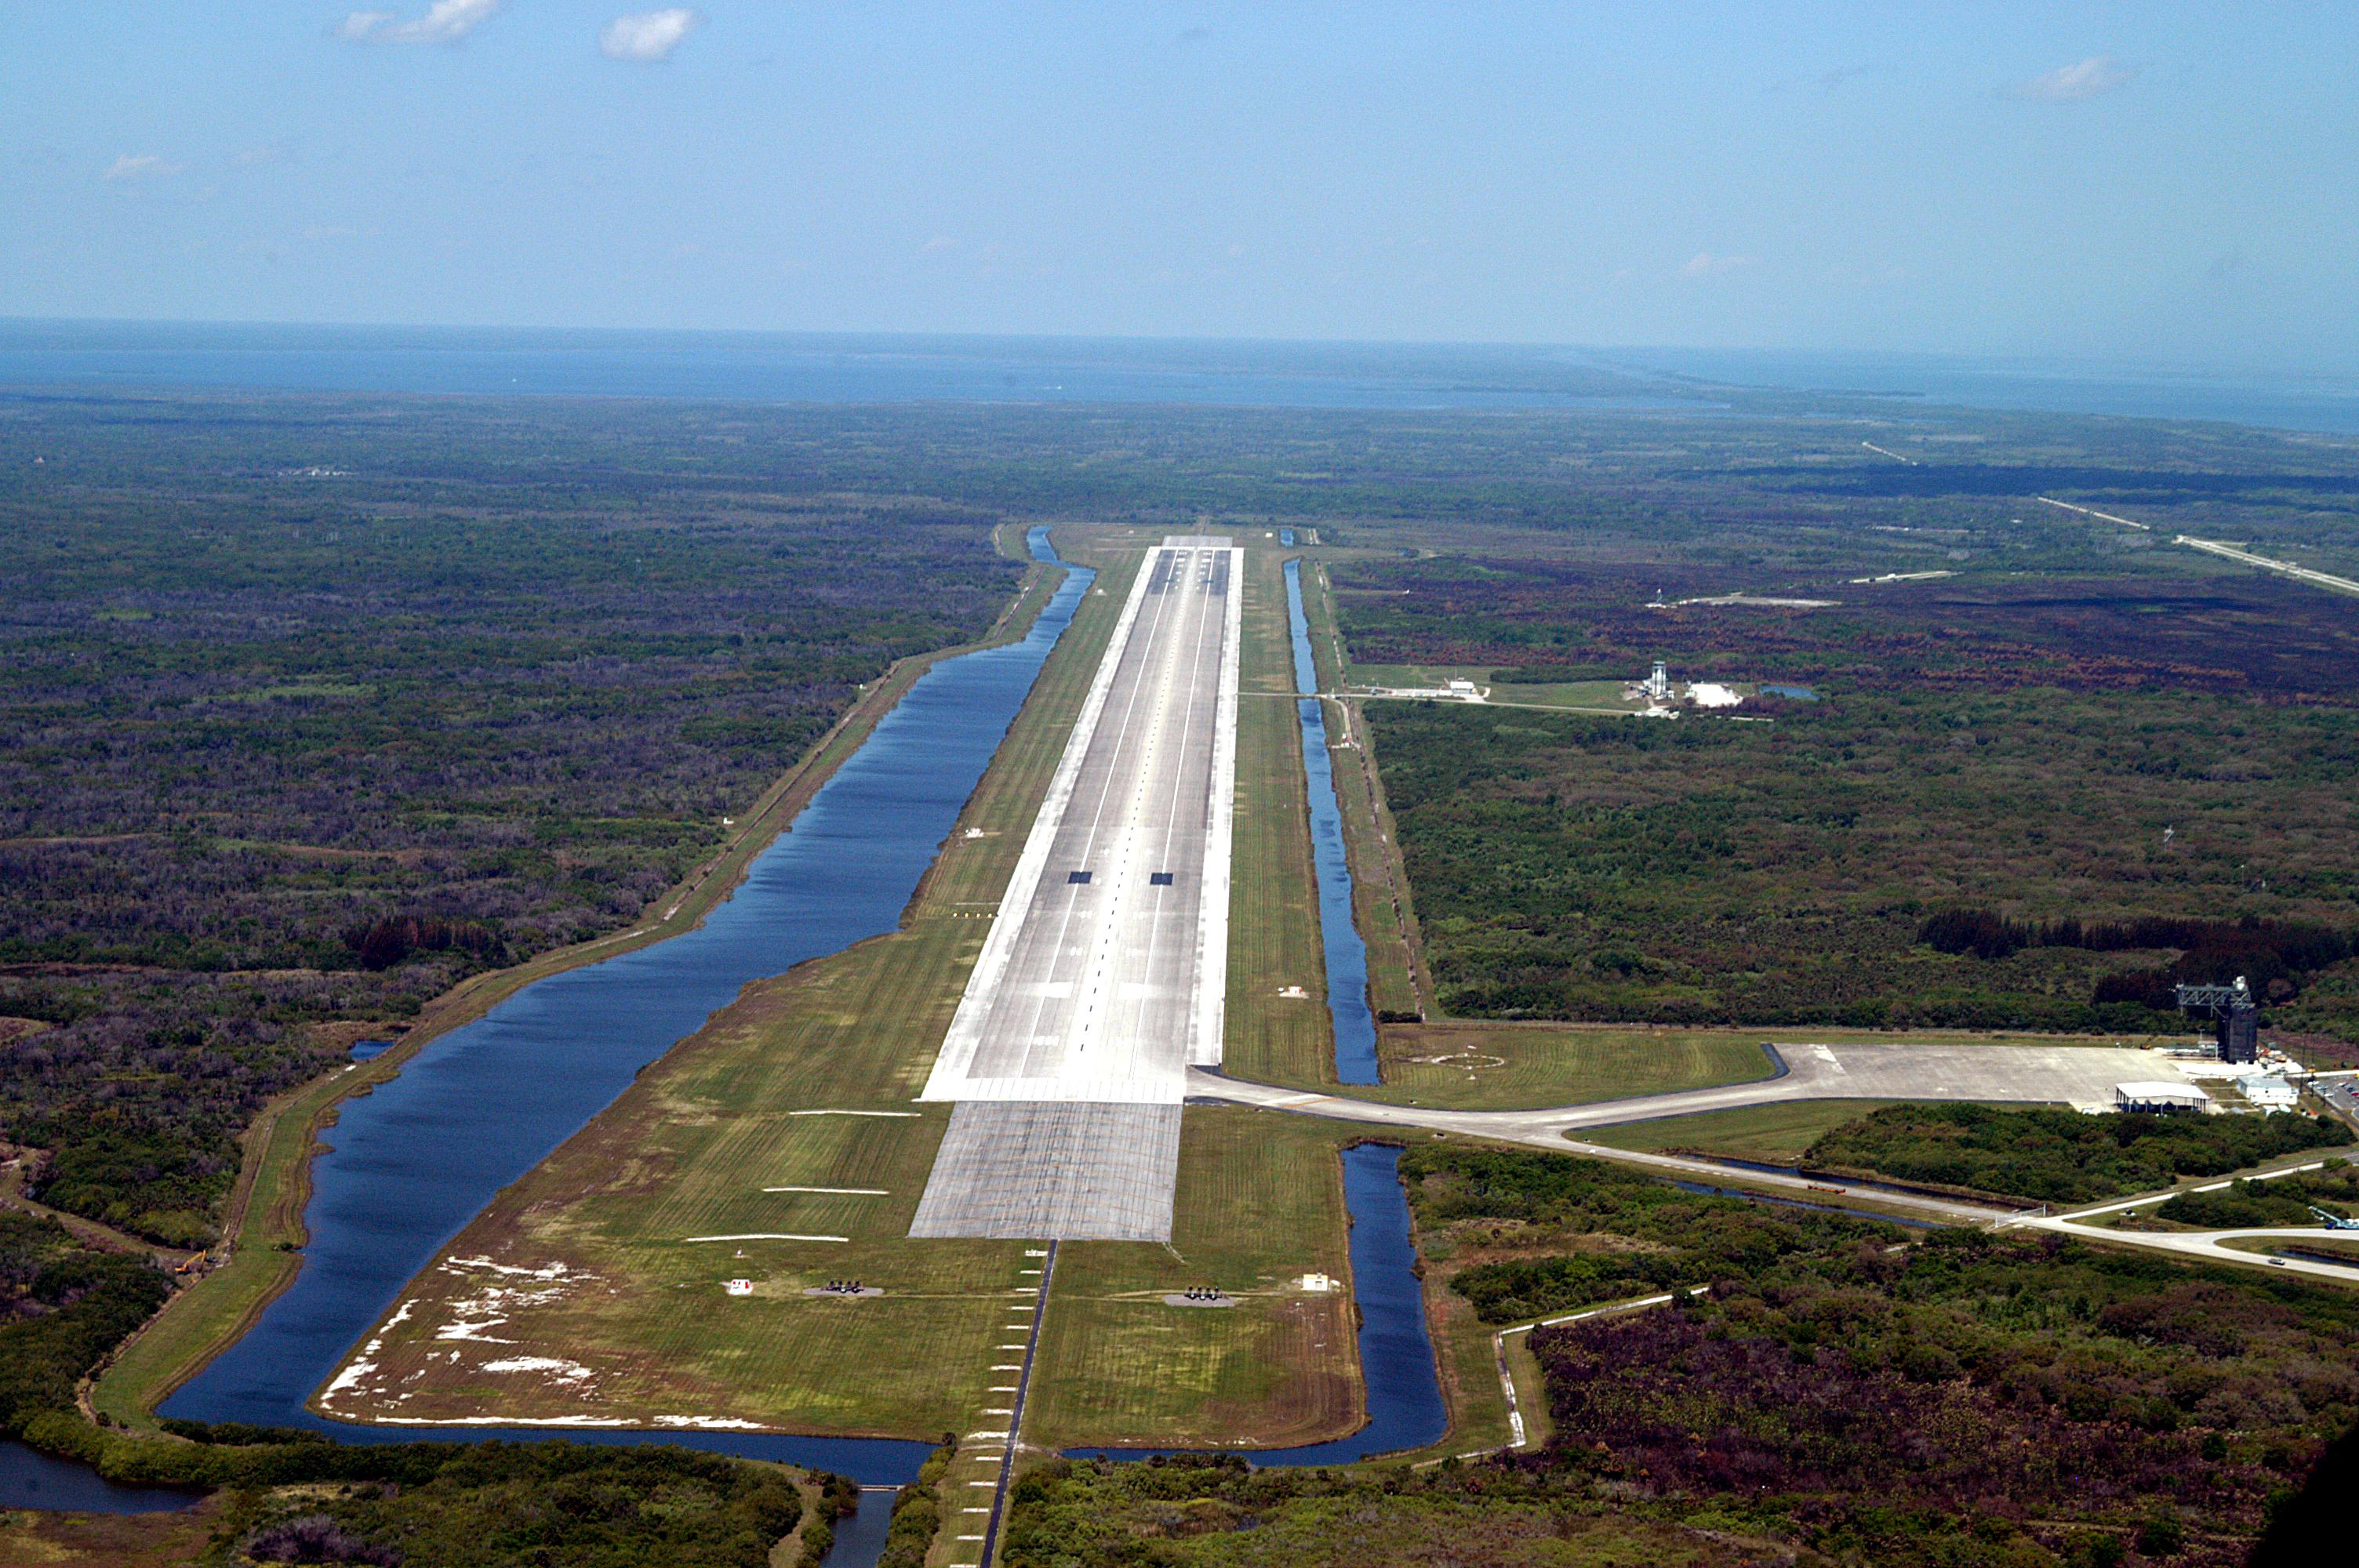 nasa crows landing airport and test facility - HD3008×2000